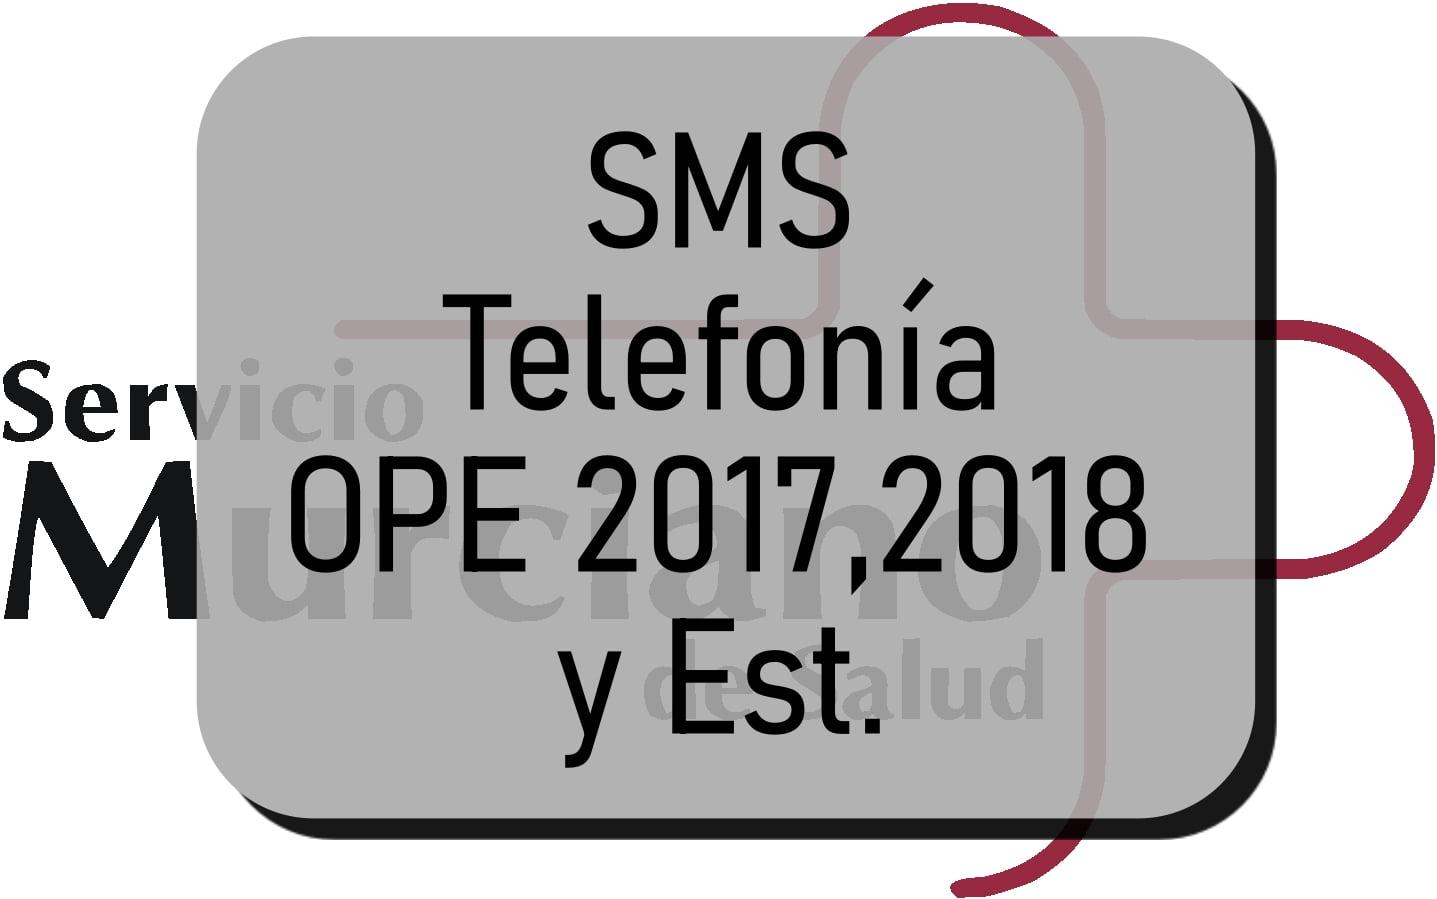 OPE SMS Telefonía